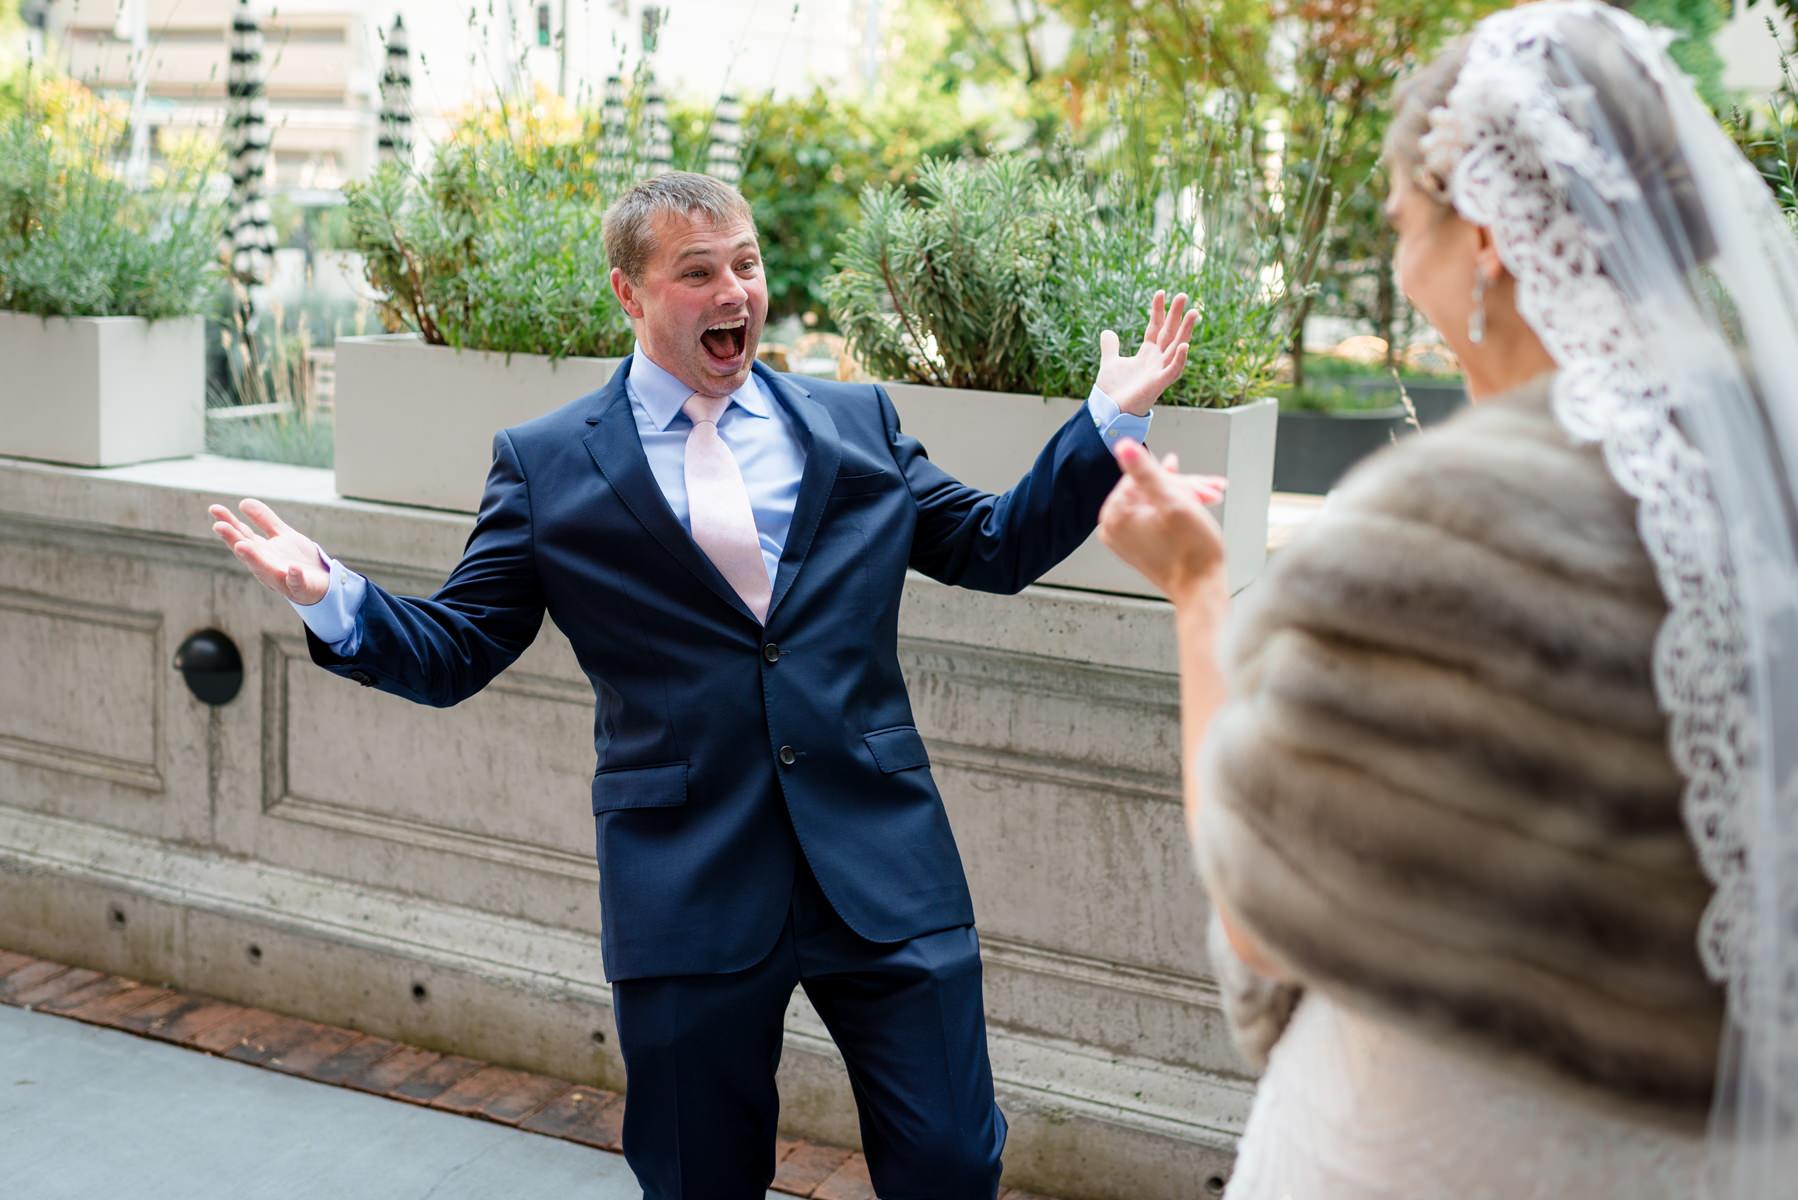 Andrew Tat - Documentary Wedding Photography - Hotel Sorrento - Seattle, Washington -Jessica & Paul - 10.jpg